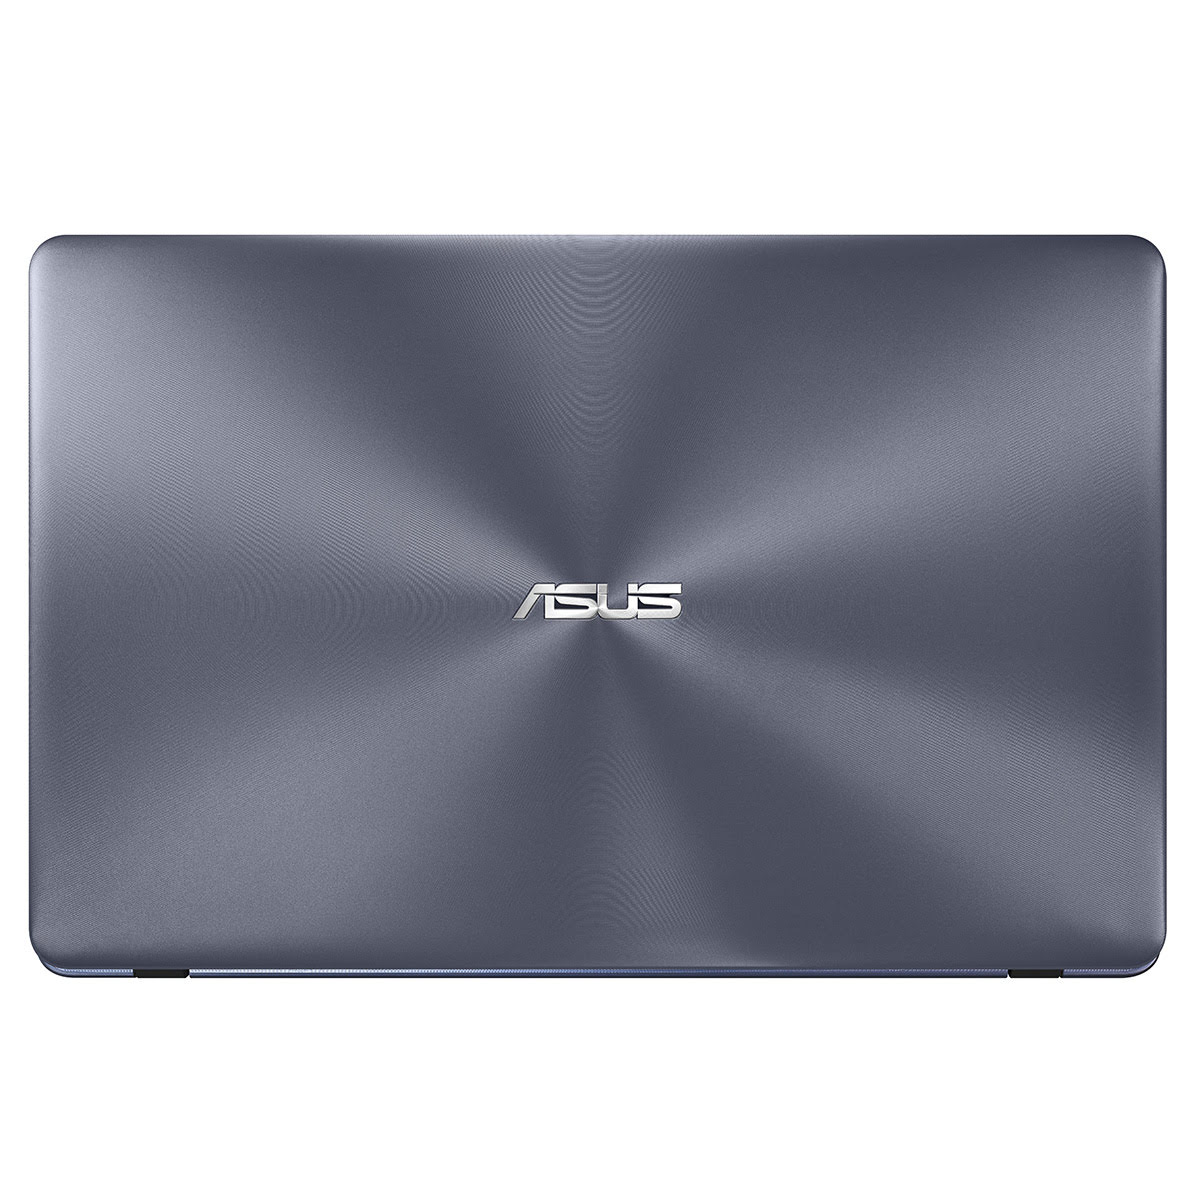 Asus 90NB0EV1-M06970 - PC portable Asus - Cybertek.fr - 2